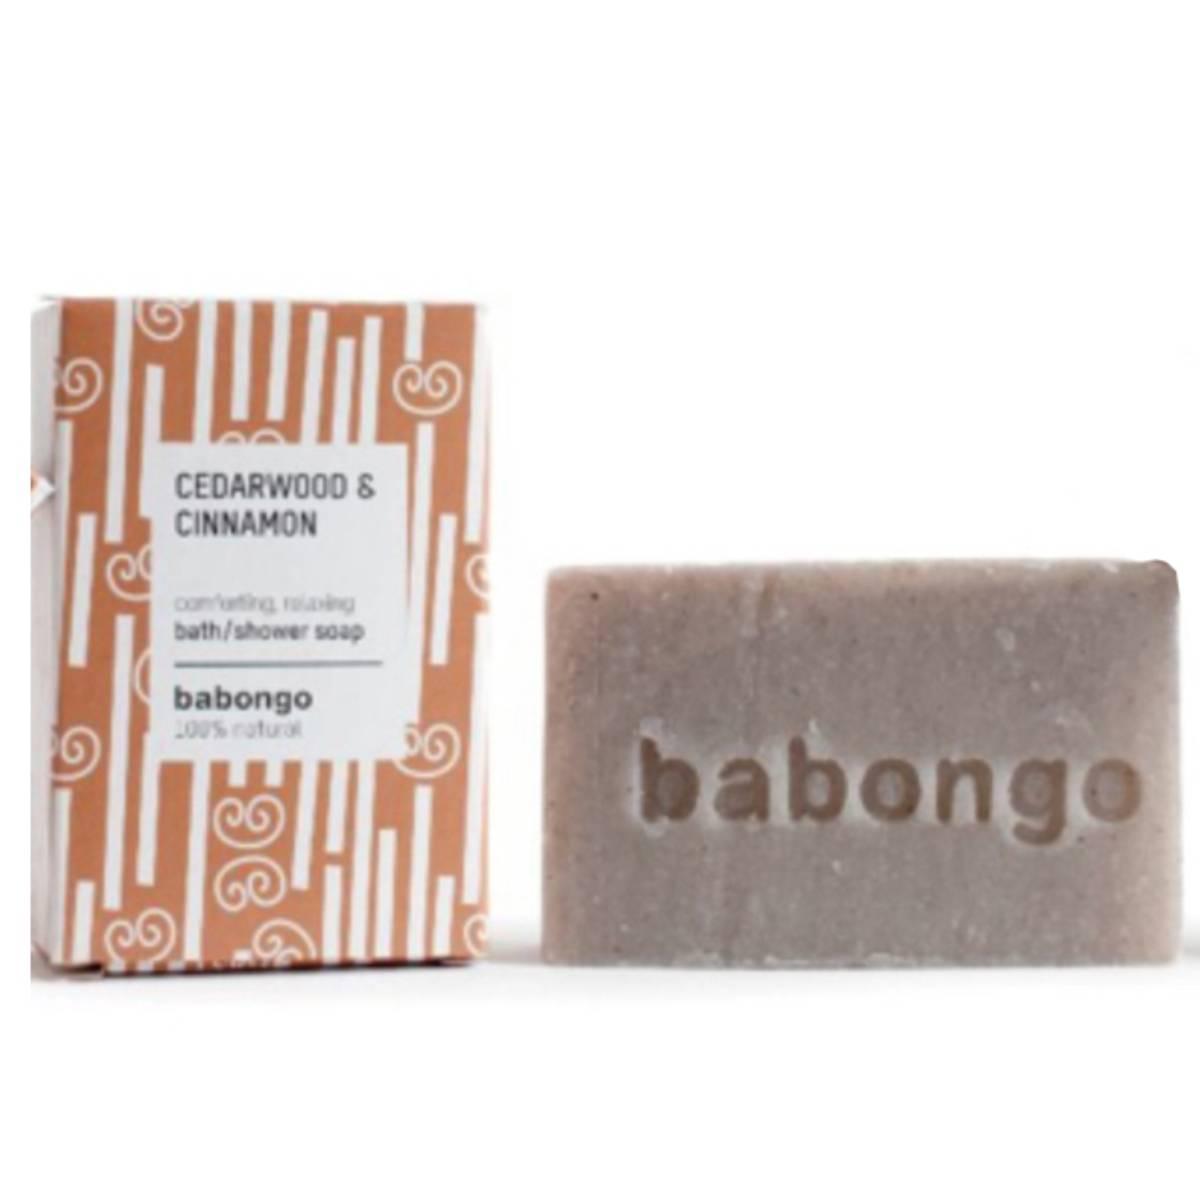 Babongo Soap Cedarwood & Cinnamon Bath&Shower